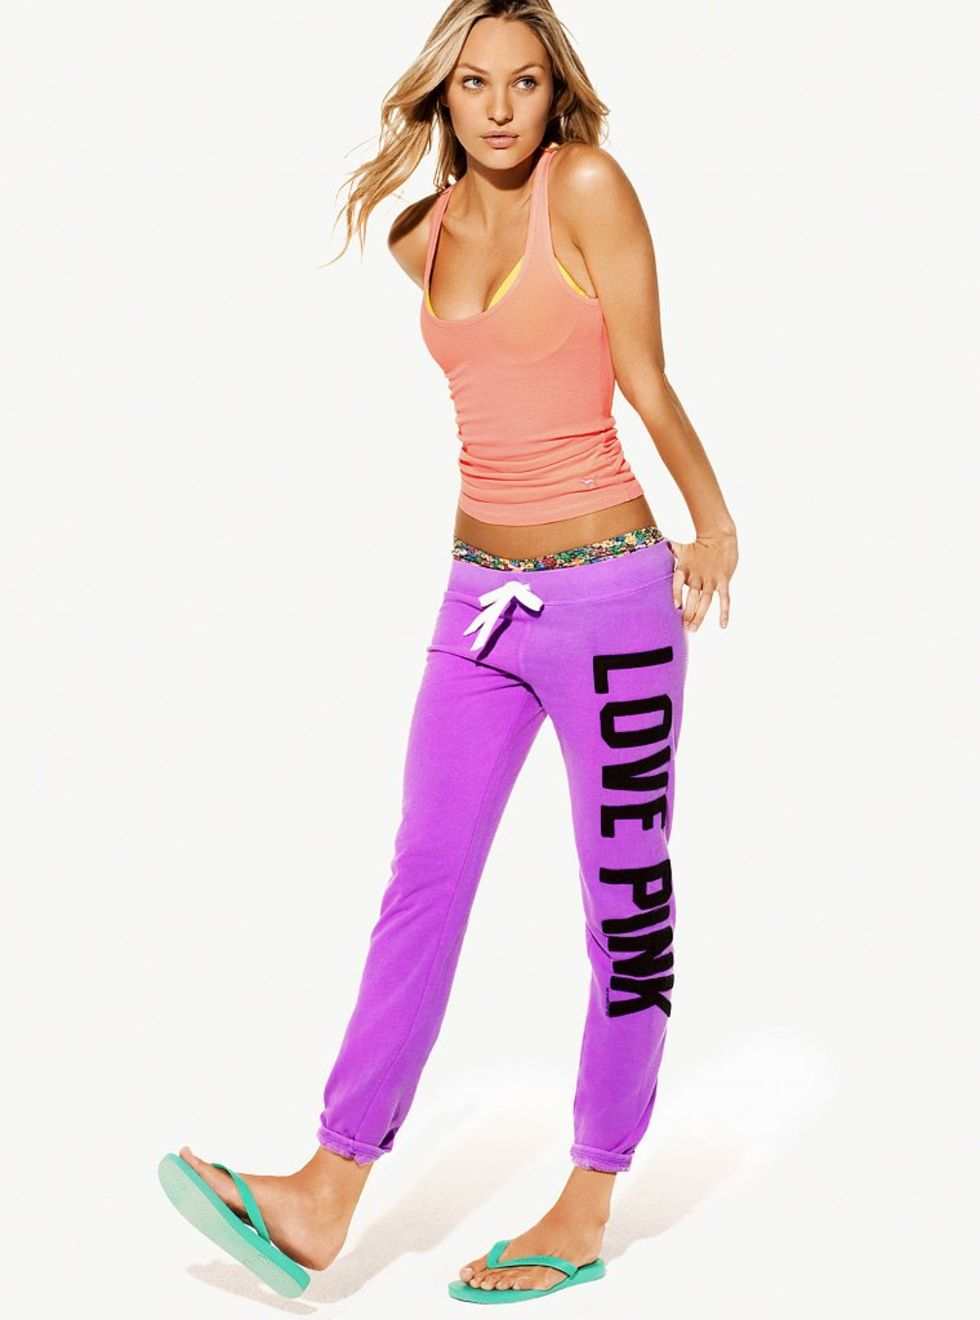 Candice Swanepoel 2010 : candice-swanepoel-victorias-secret-love-pink-campaign-02